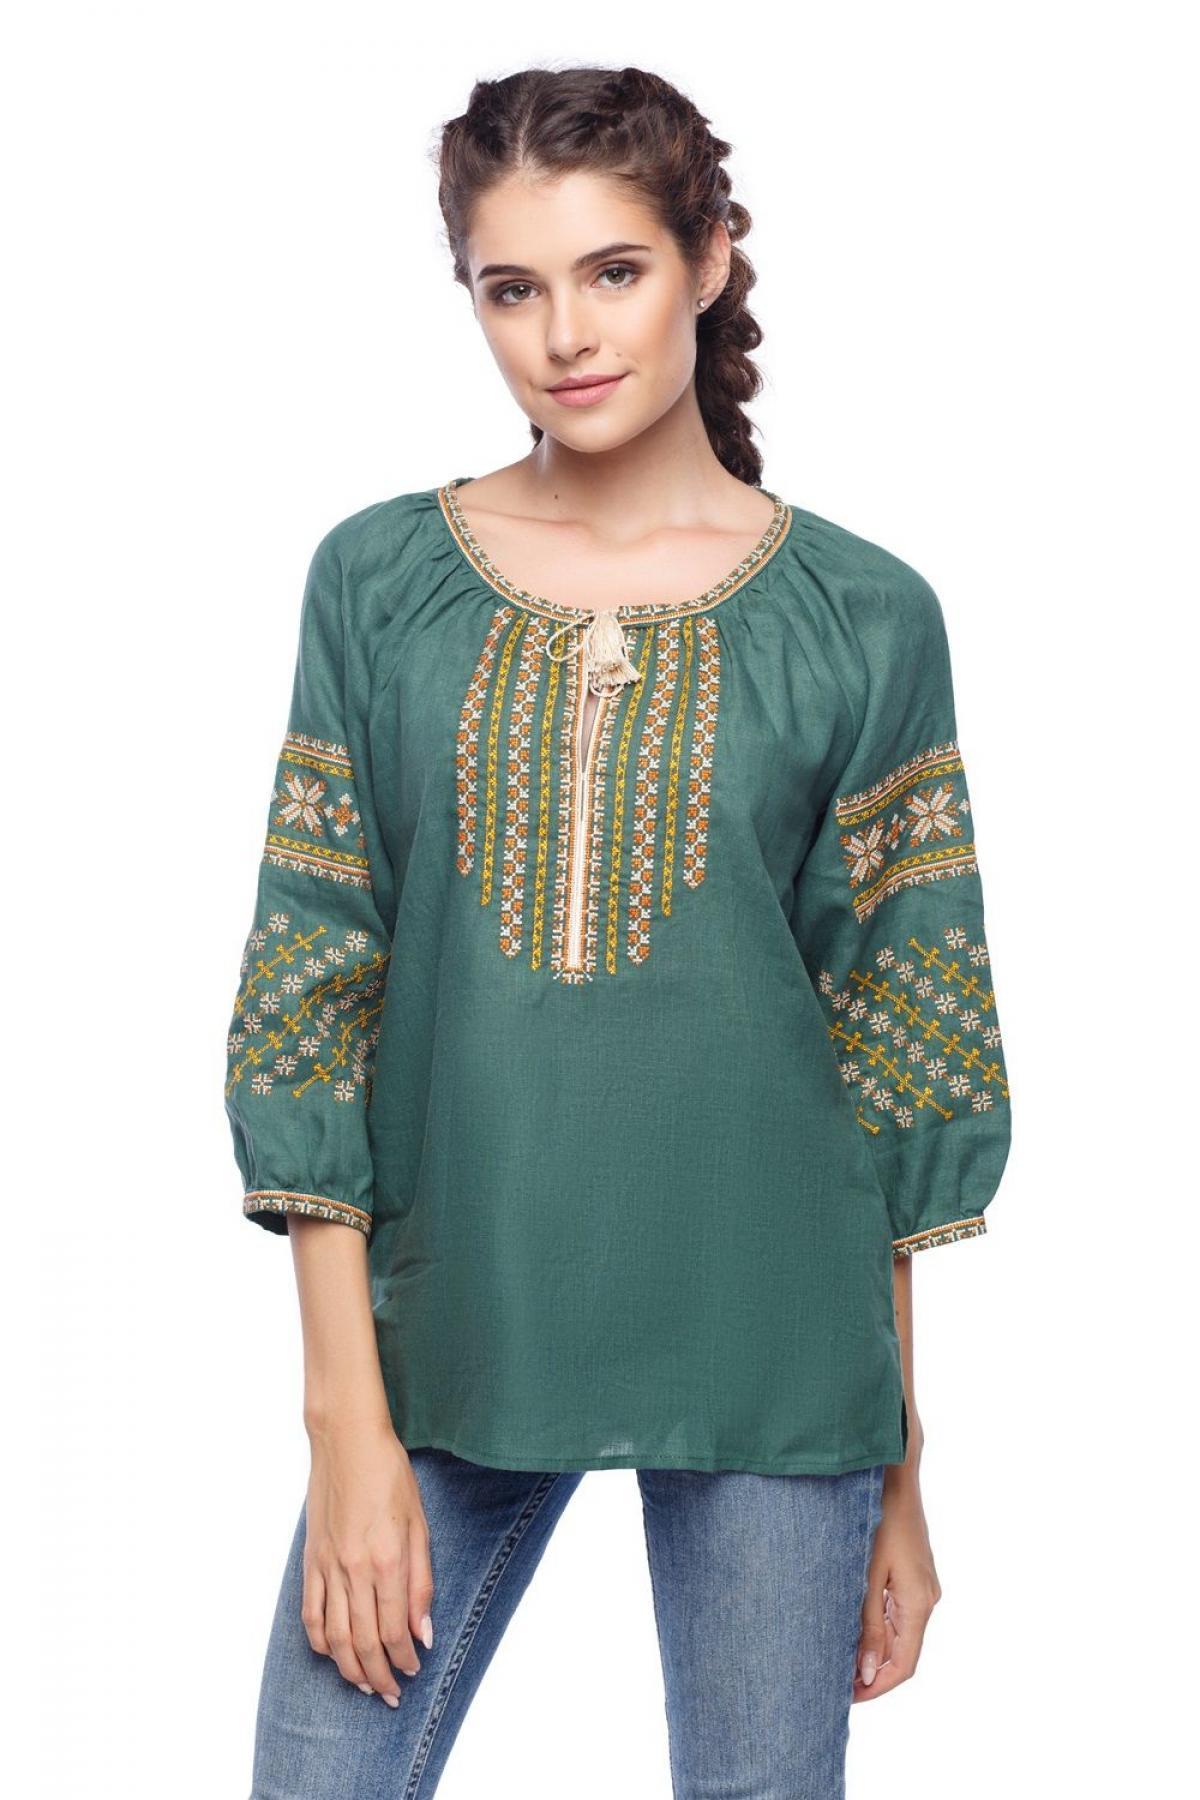 Green embroidered shirt with 3/4 sleeves. Photo №1. | Narodnyi dim Ukraine